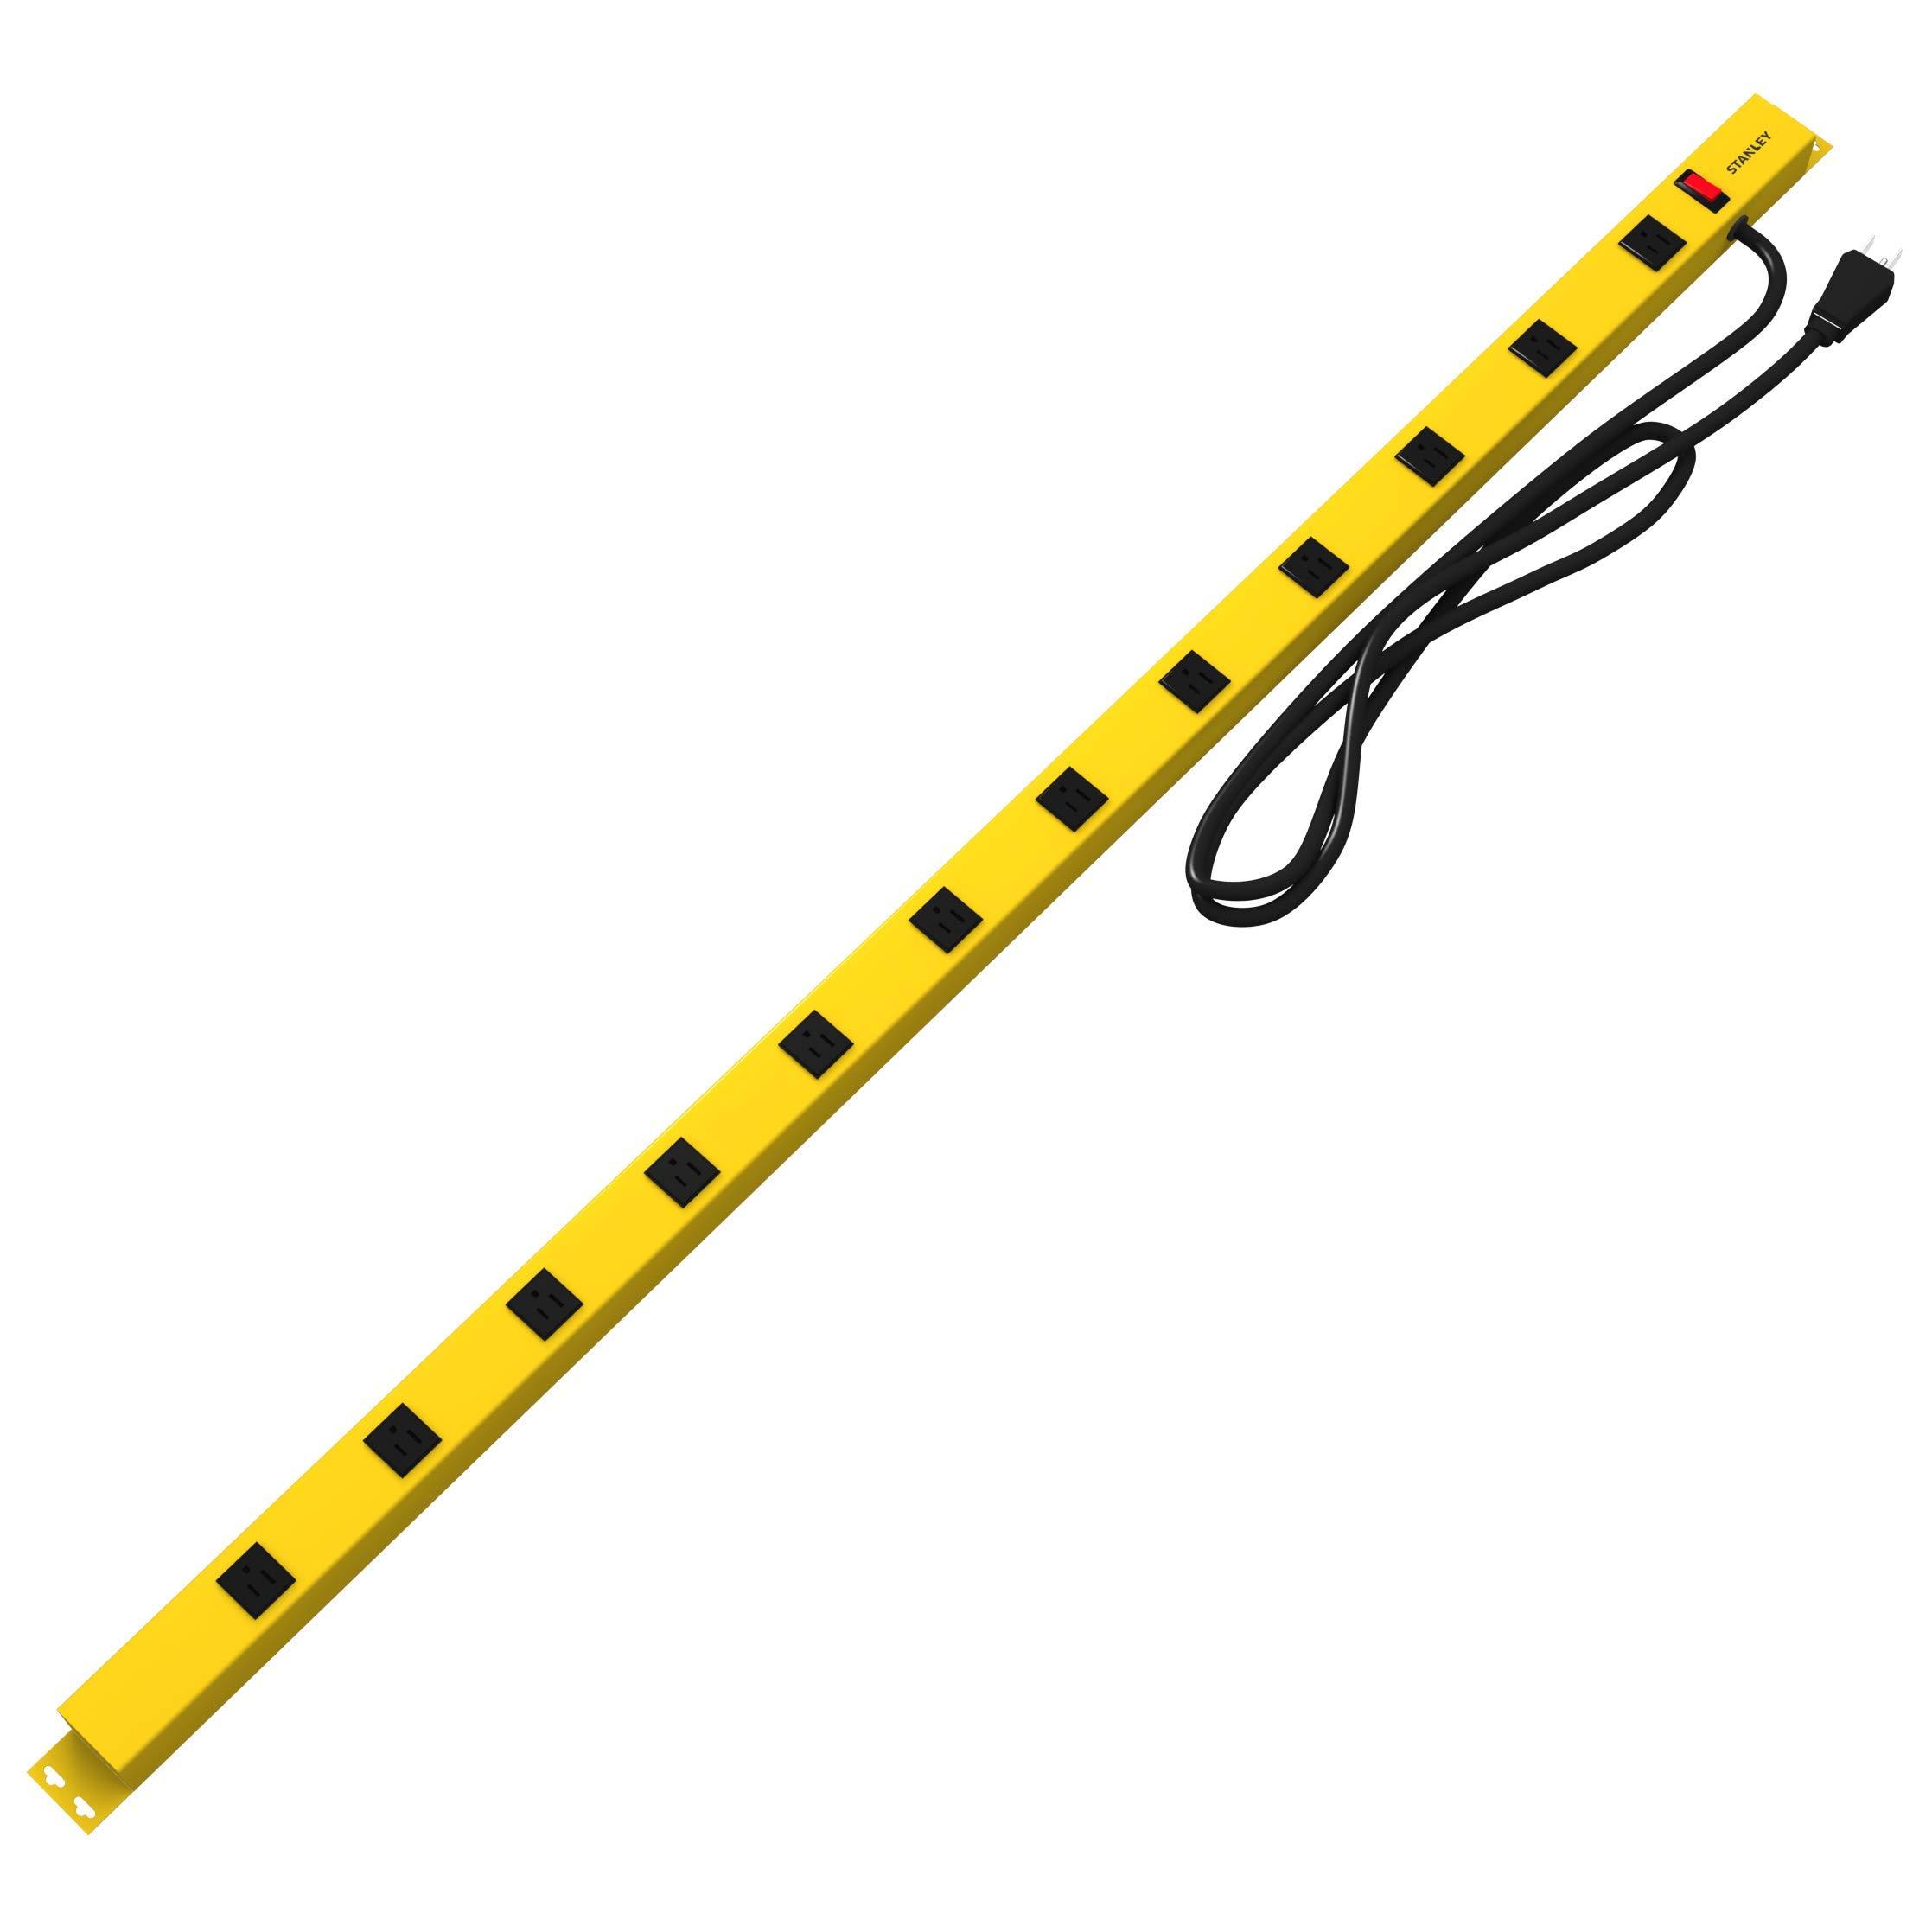 Stanley 31616 Pro12 Shop Max Metal Power Bar, Black/Yellow, 1-Pack